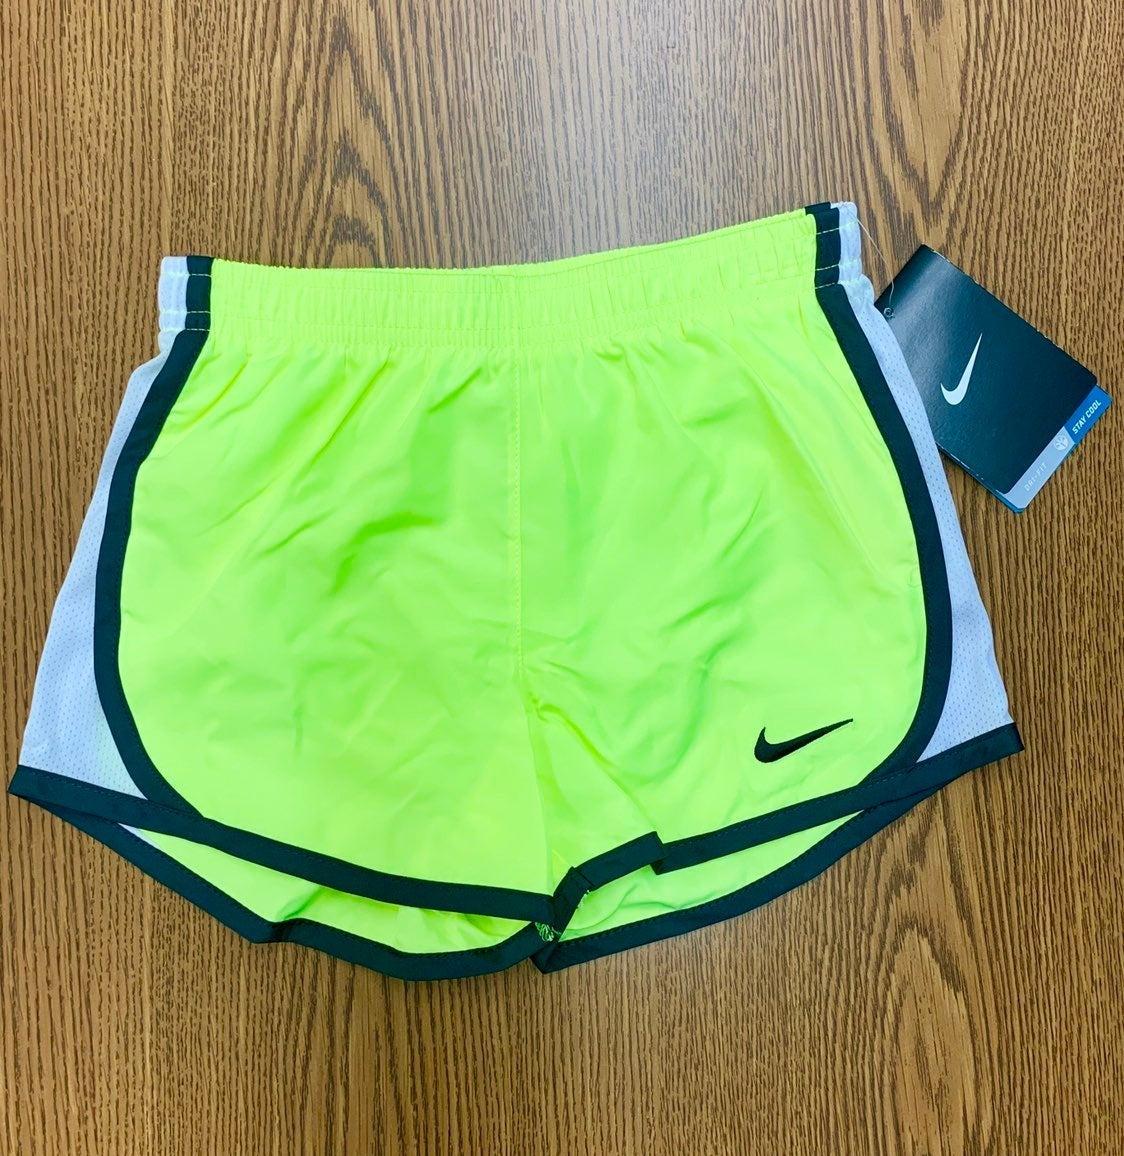 Nike Dri-Fit Girls Shorts Sz 5 NWT